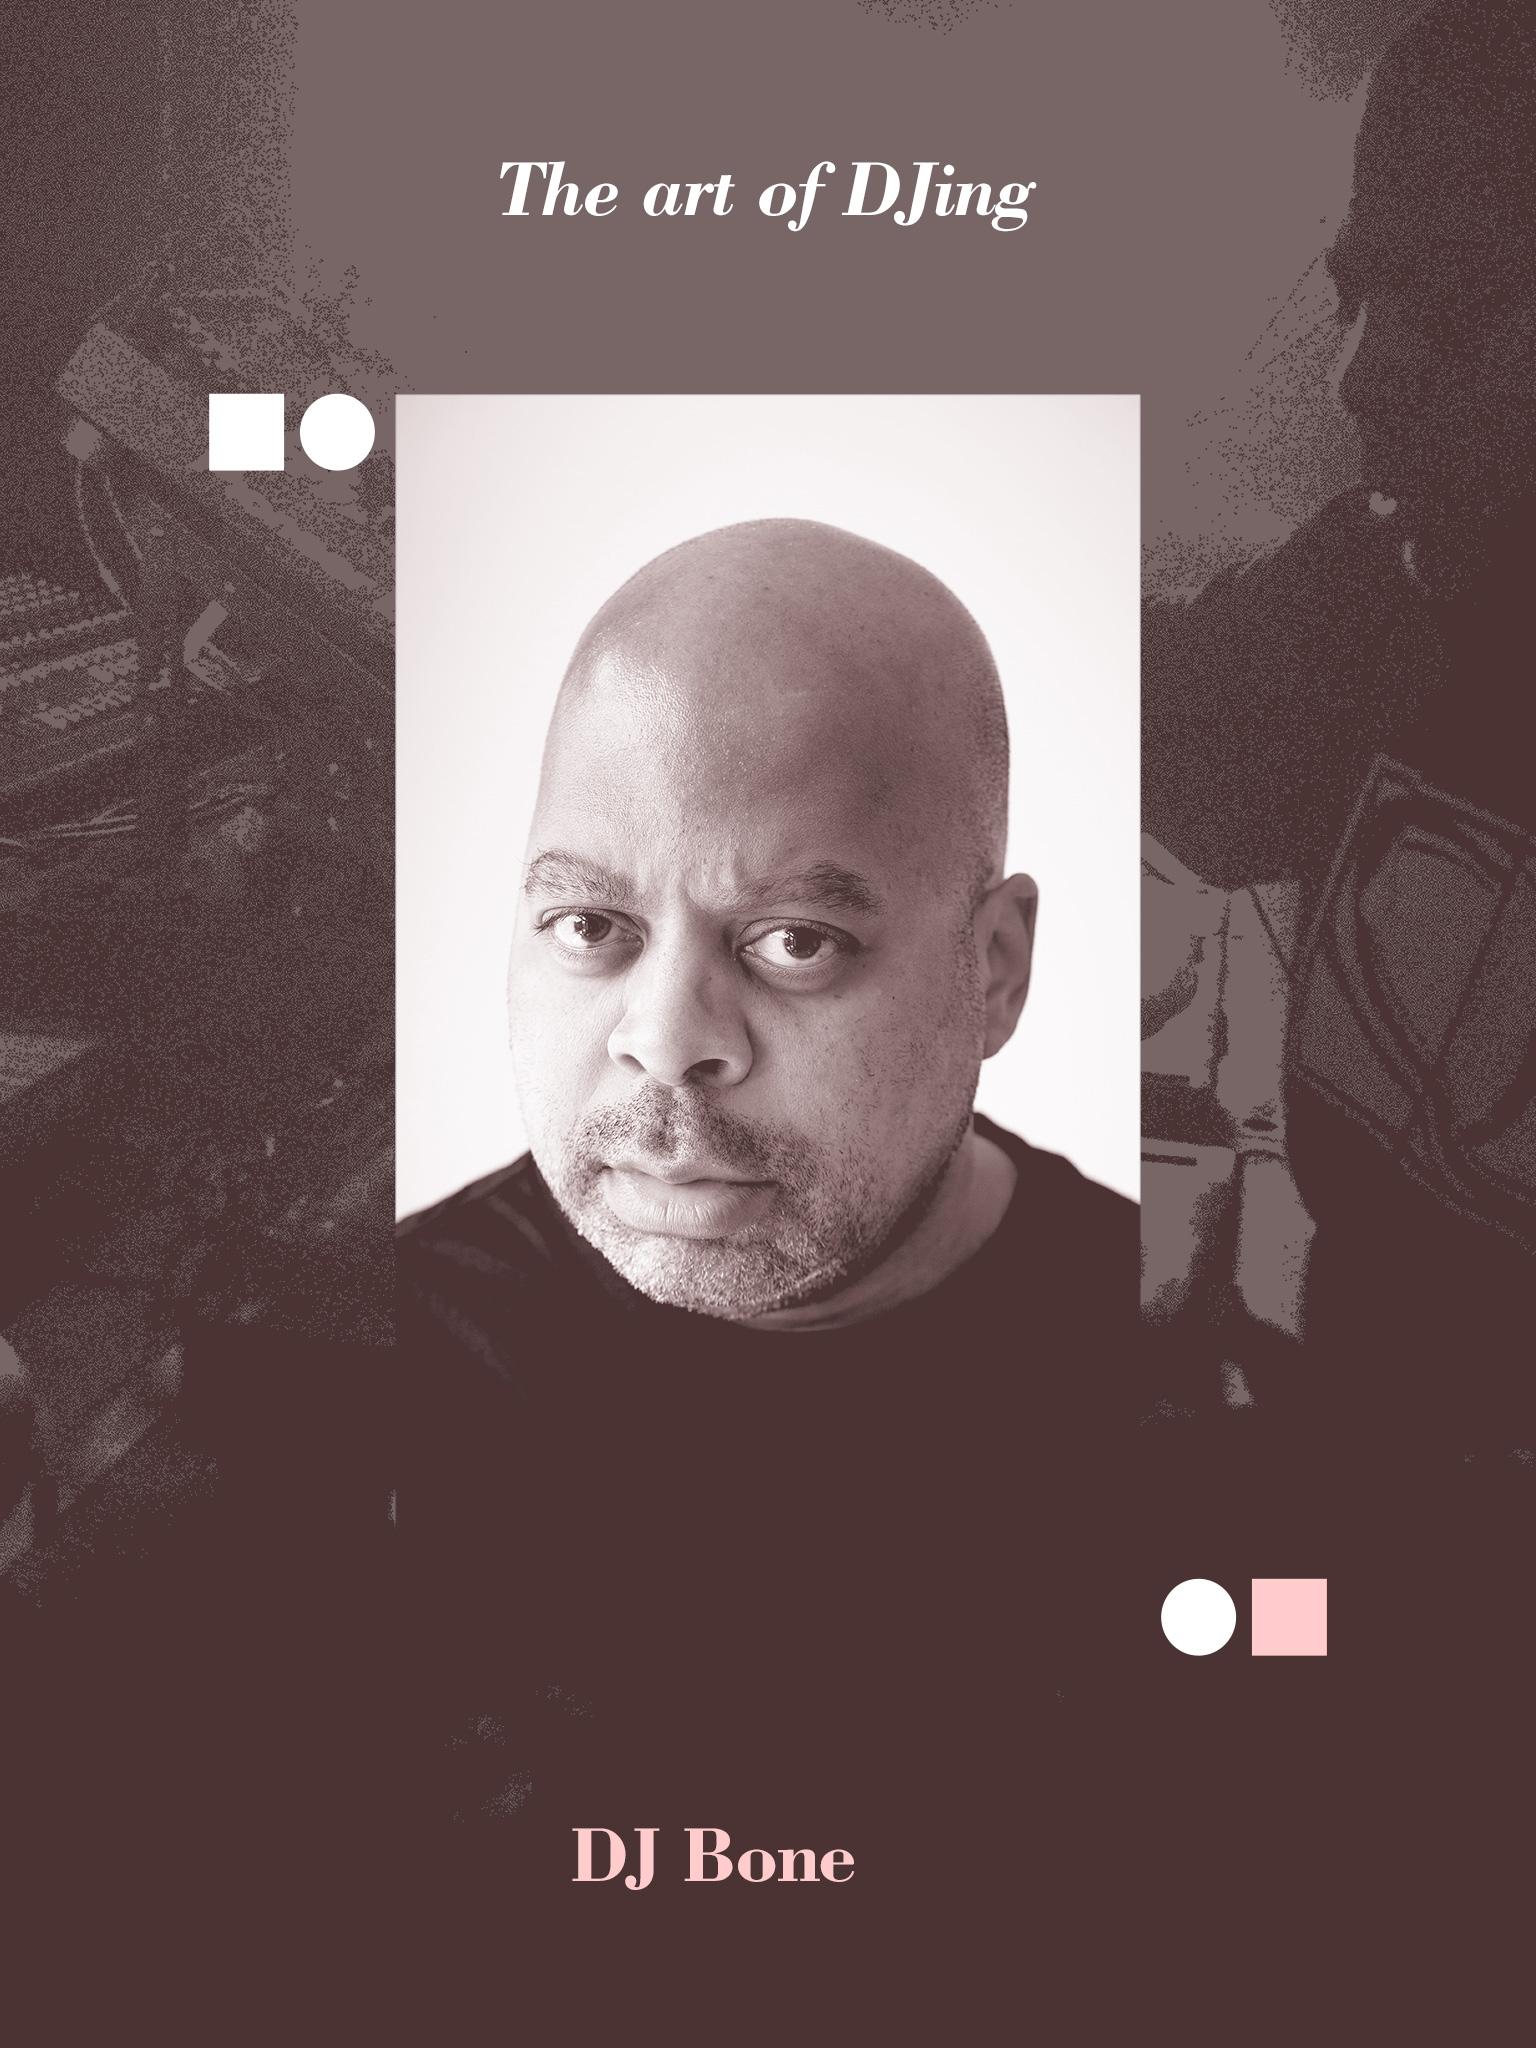 The art of DJing: DJ Bone